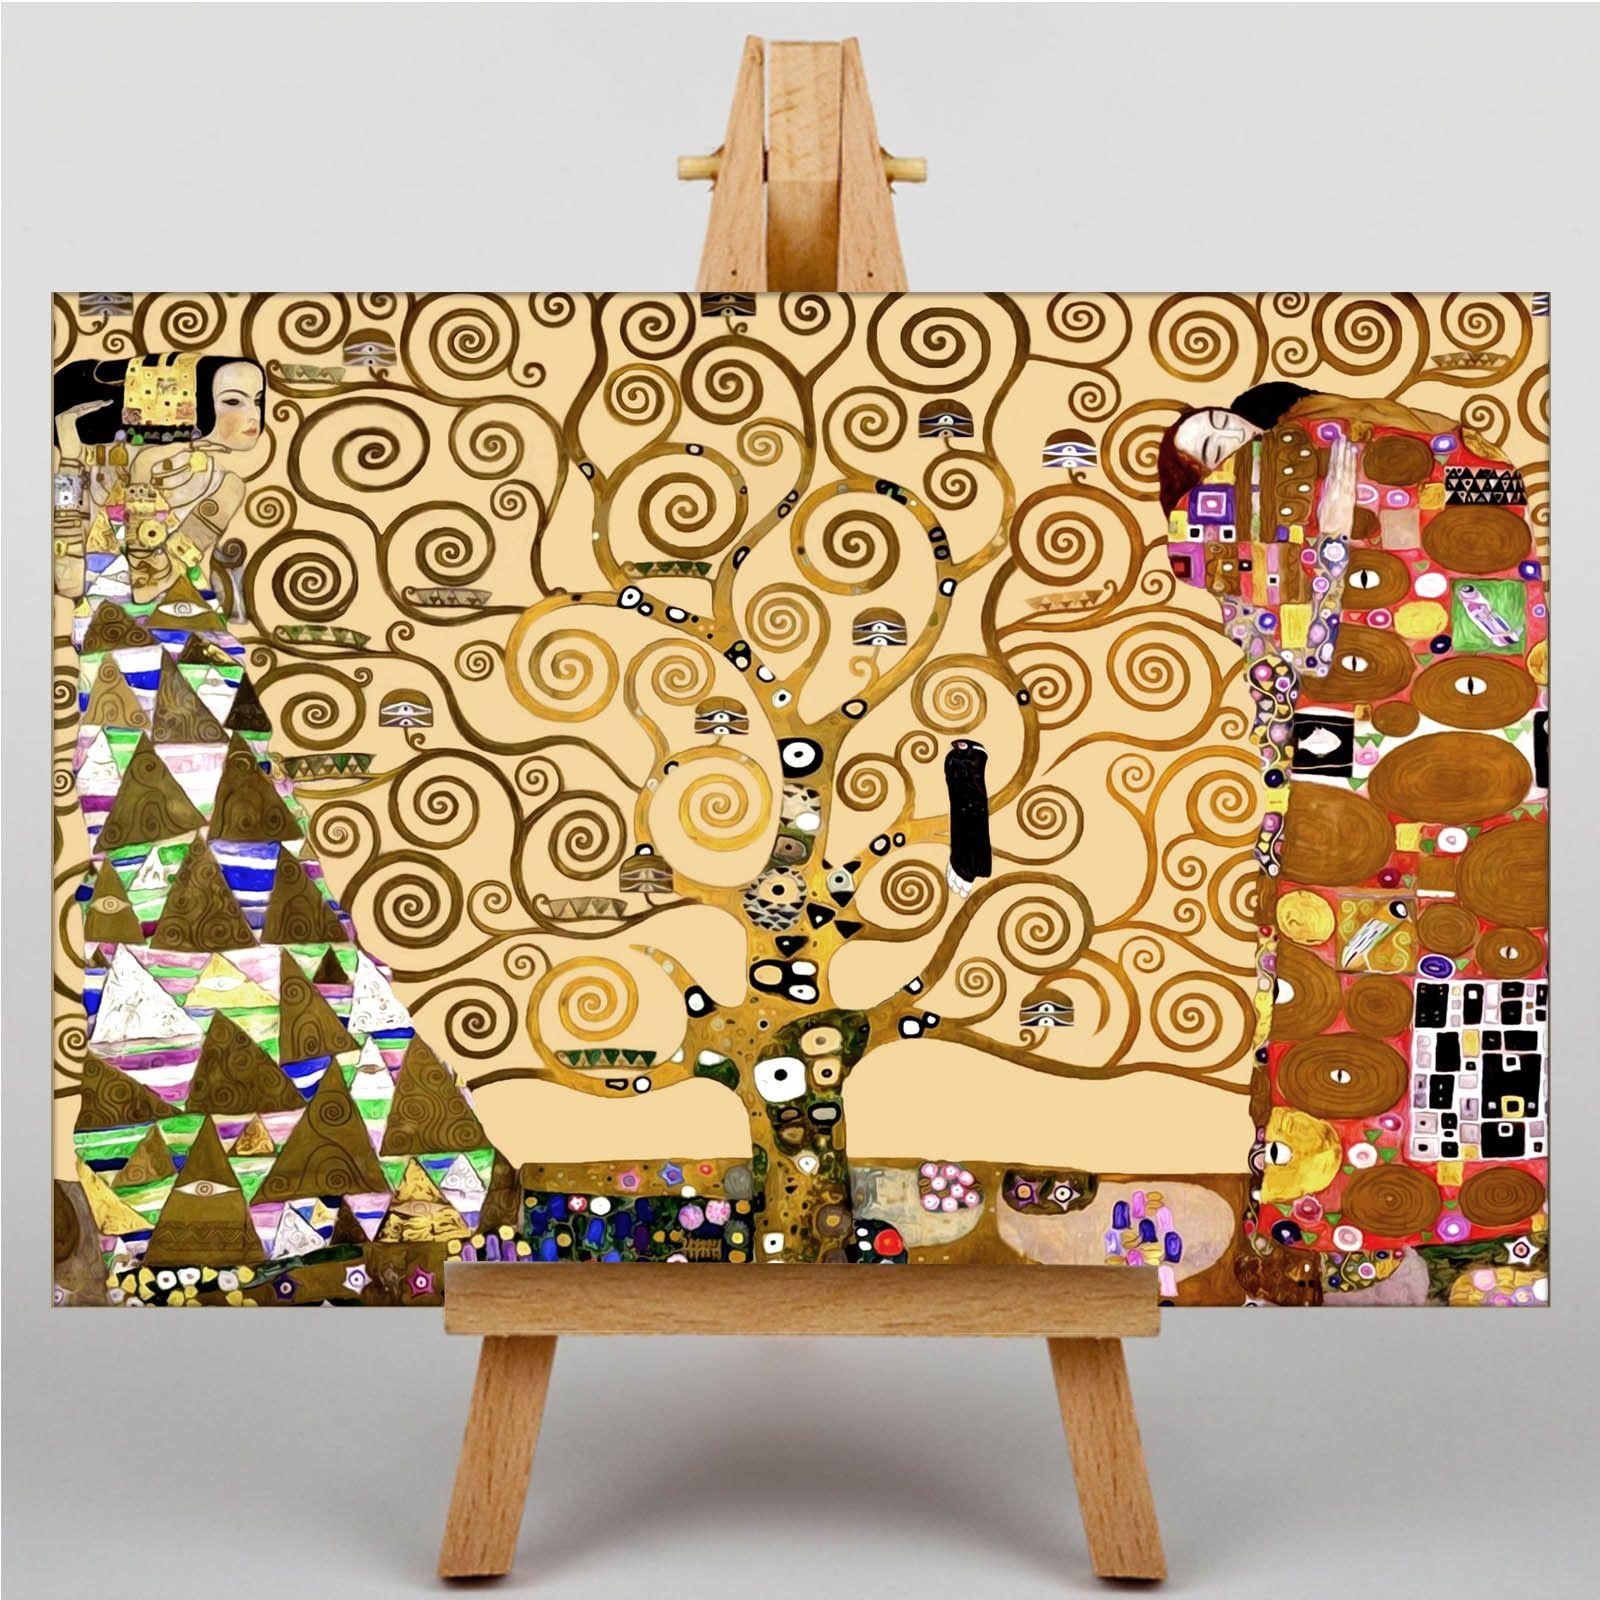 LARGE WALL ART 30x20 Inch - Gustav Klimt - The Tree of Life   Klimt ...